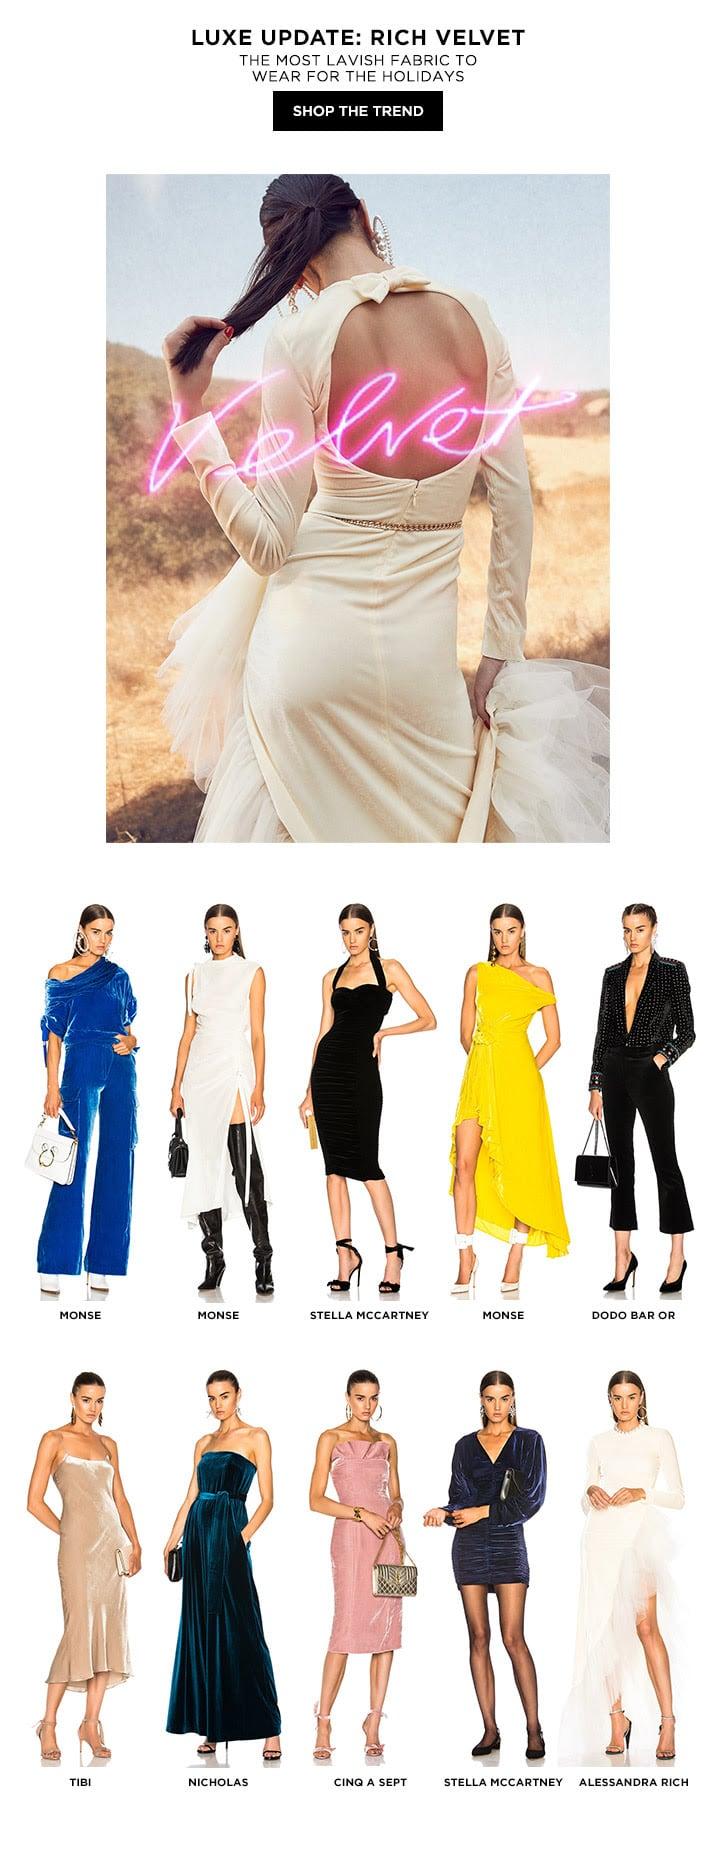 Luxe Update: Rich Velvet - Shop the Trend